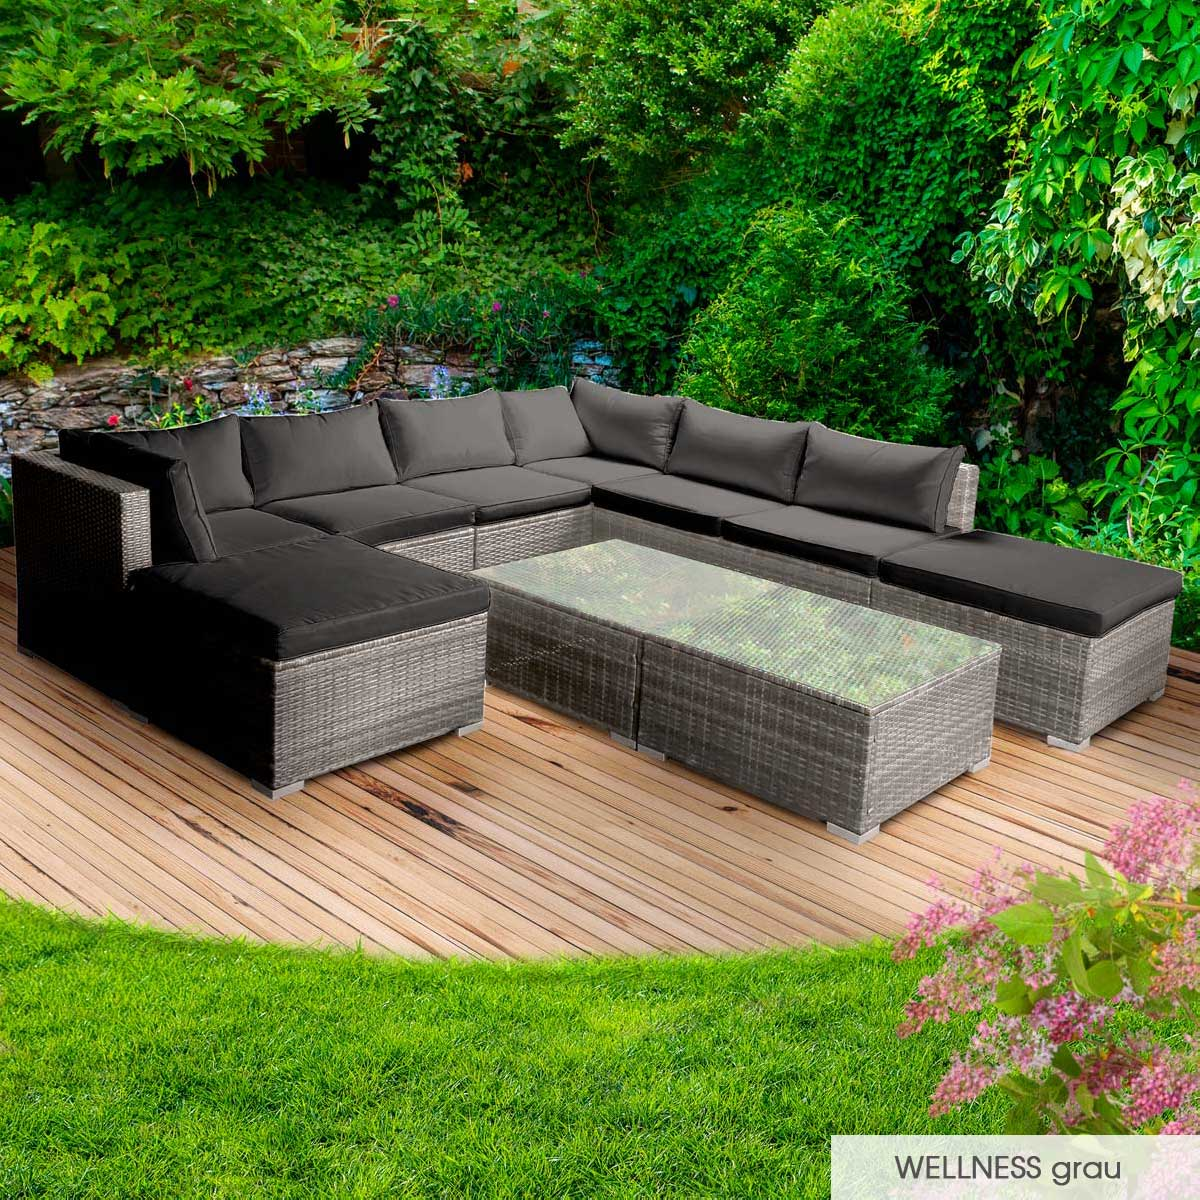 Gartenmoebel-Poly-Rattan-Lounge-Moebel-Sitzgarnitur-Gartengarnitur-Sitzgruppe-Sofa Indexbild 42